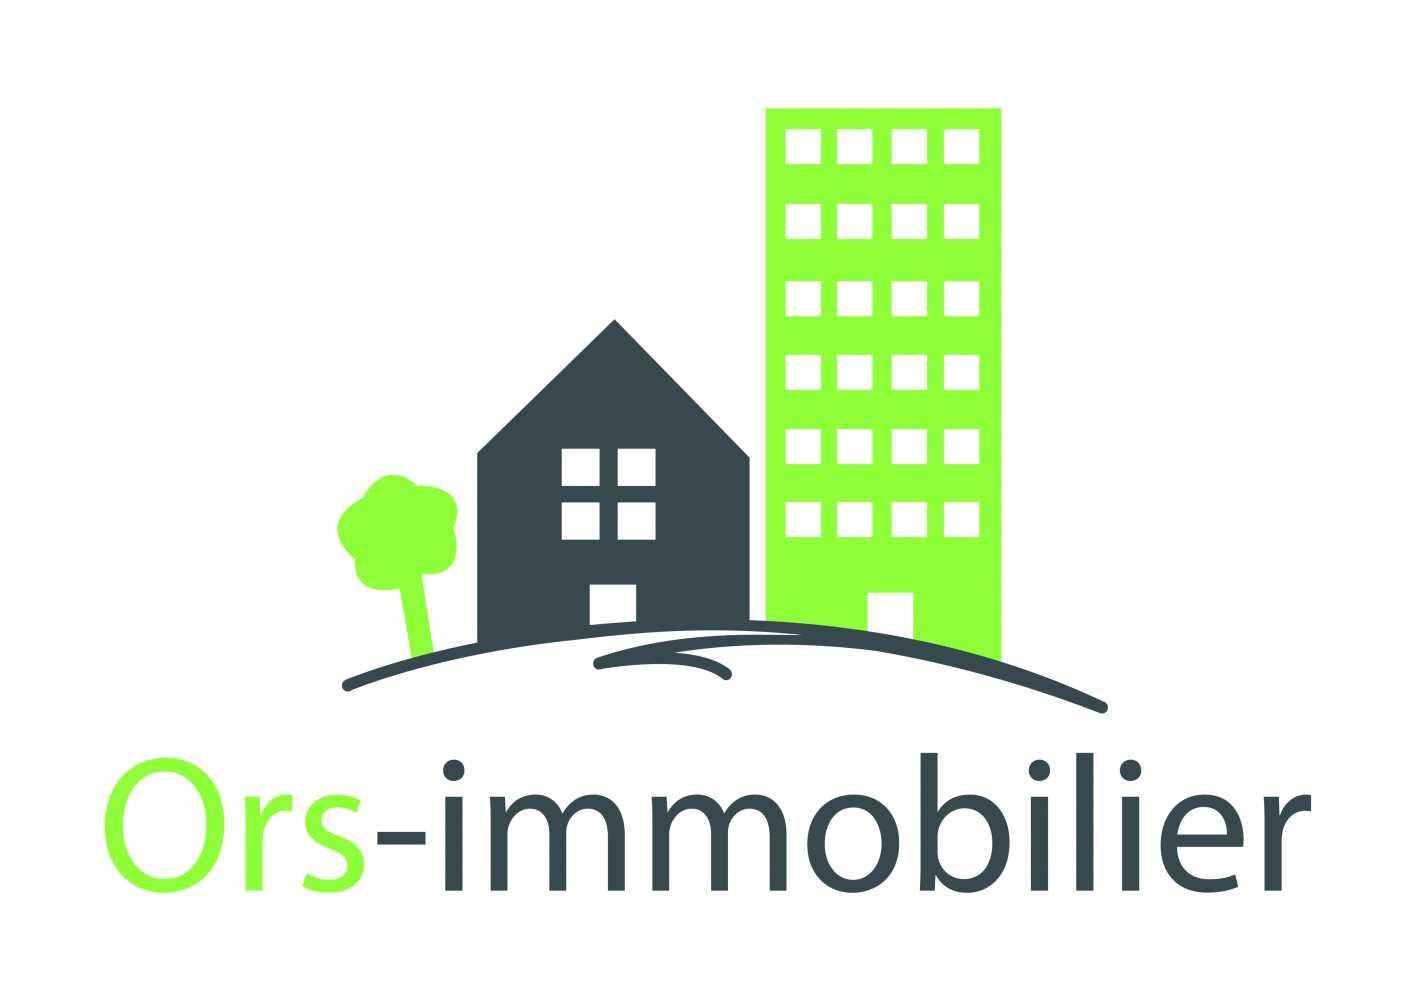 Logo Ors immobilier pub.jpg